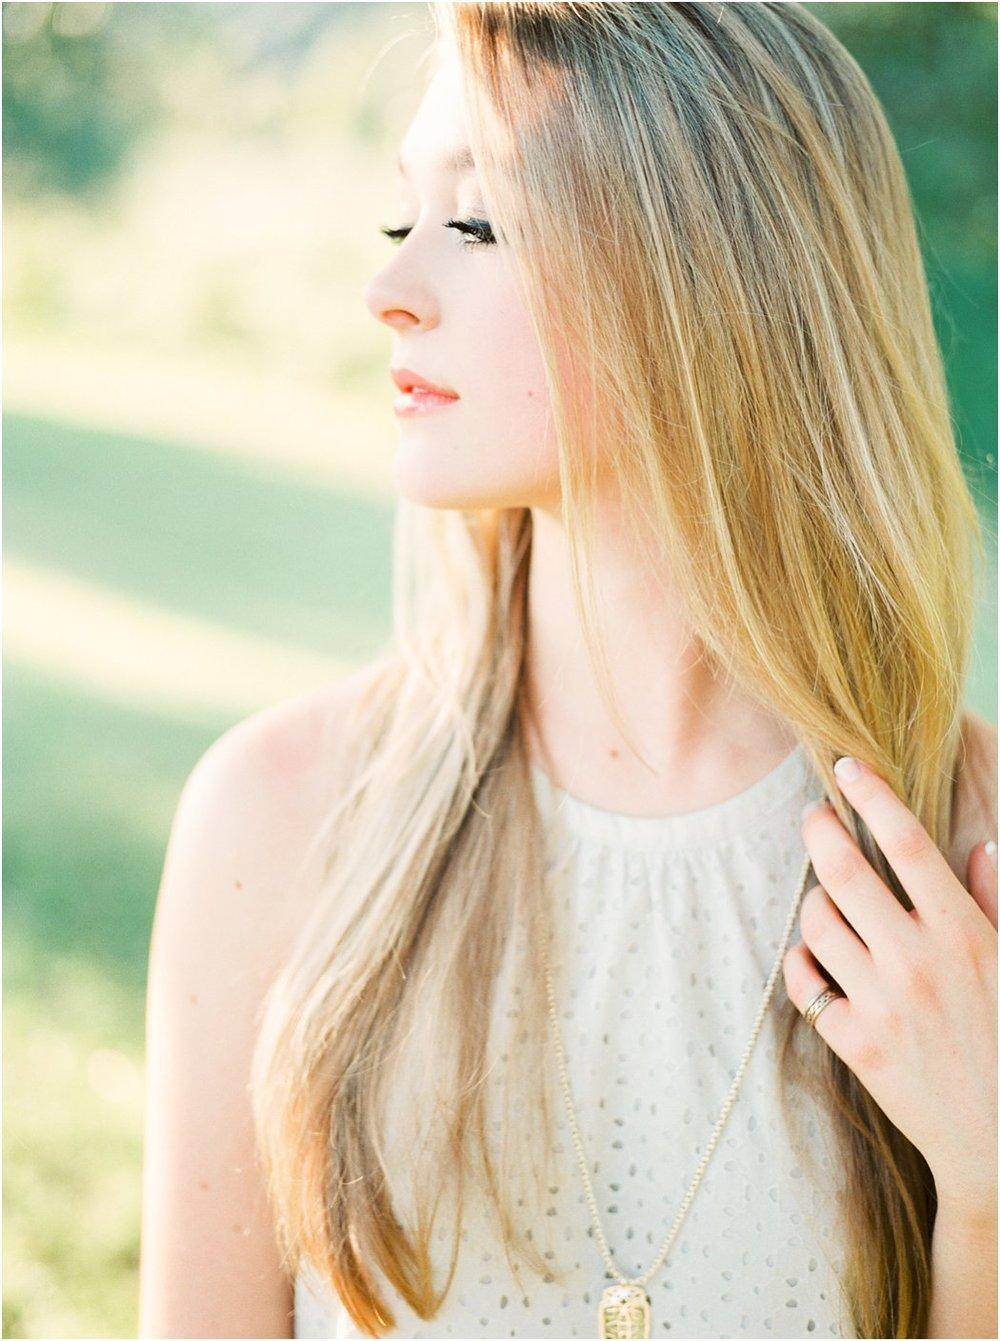 Jessica Christine Photography - Senior Photography